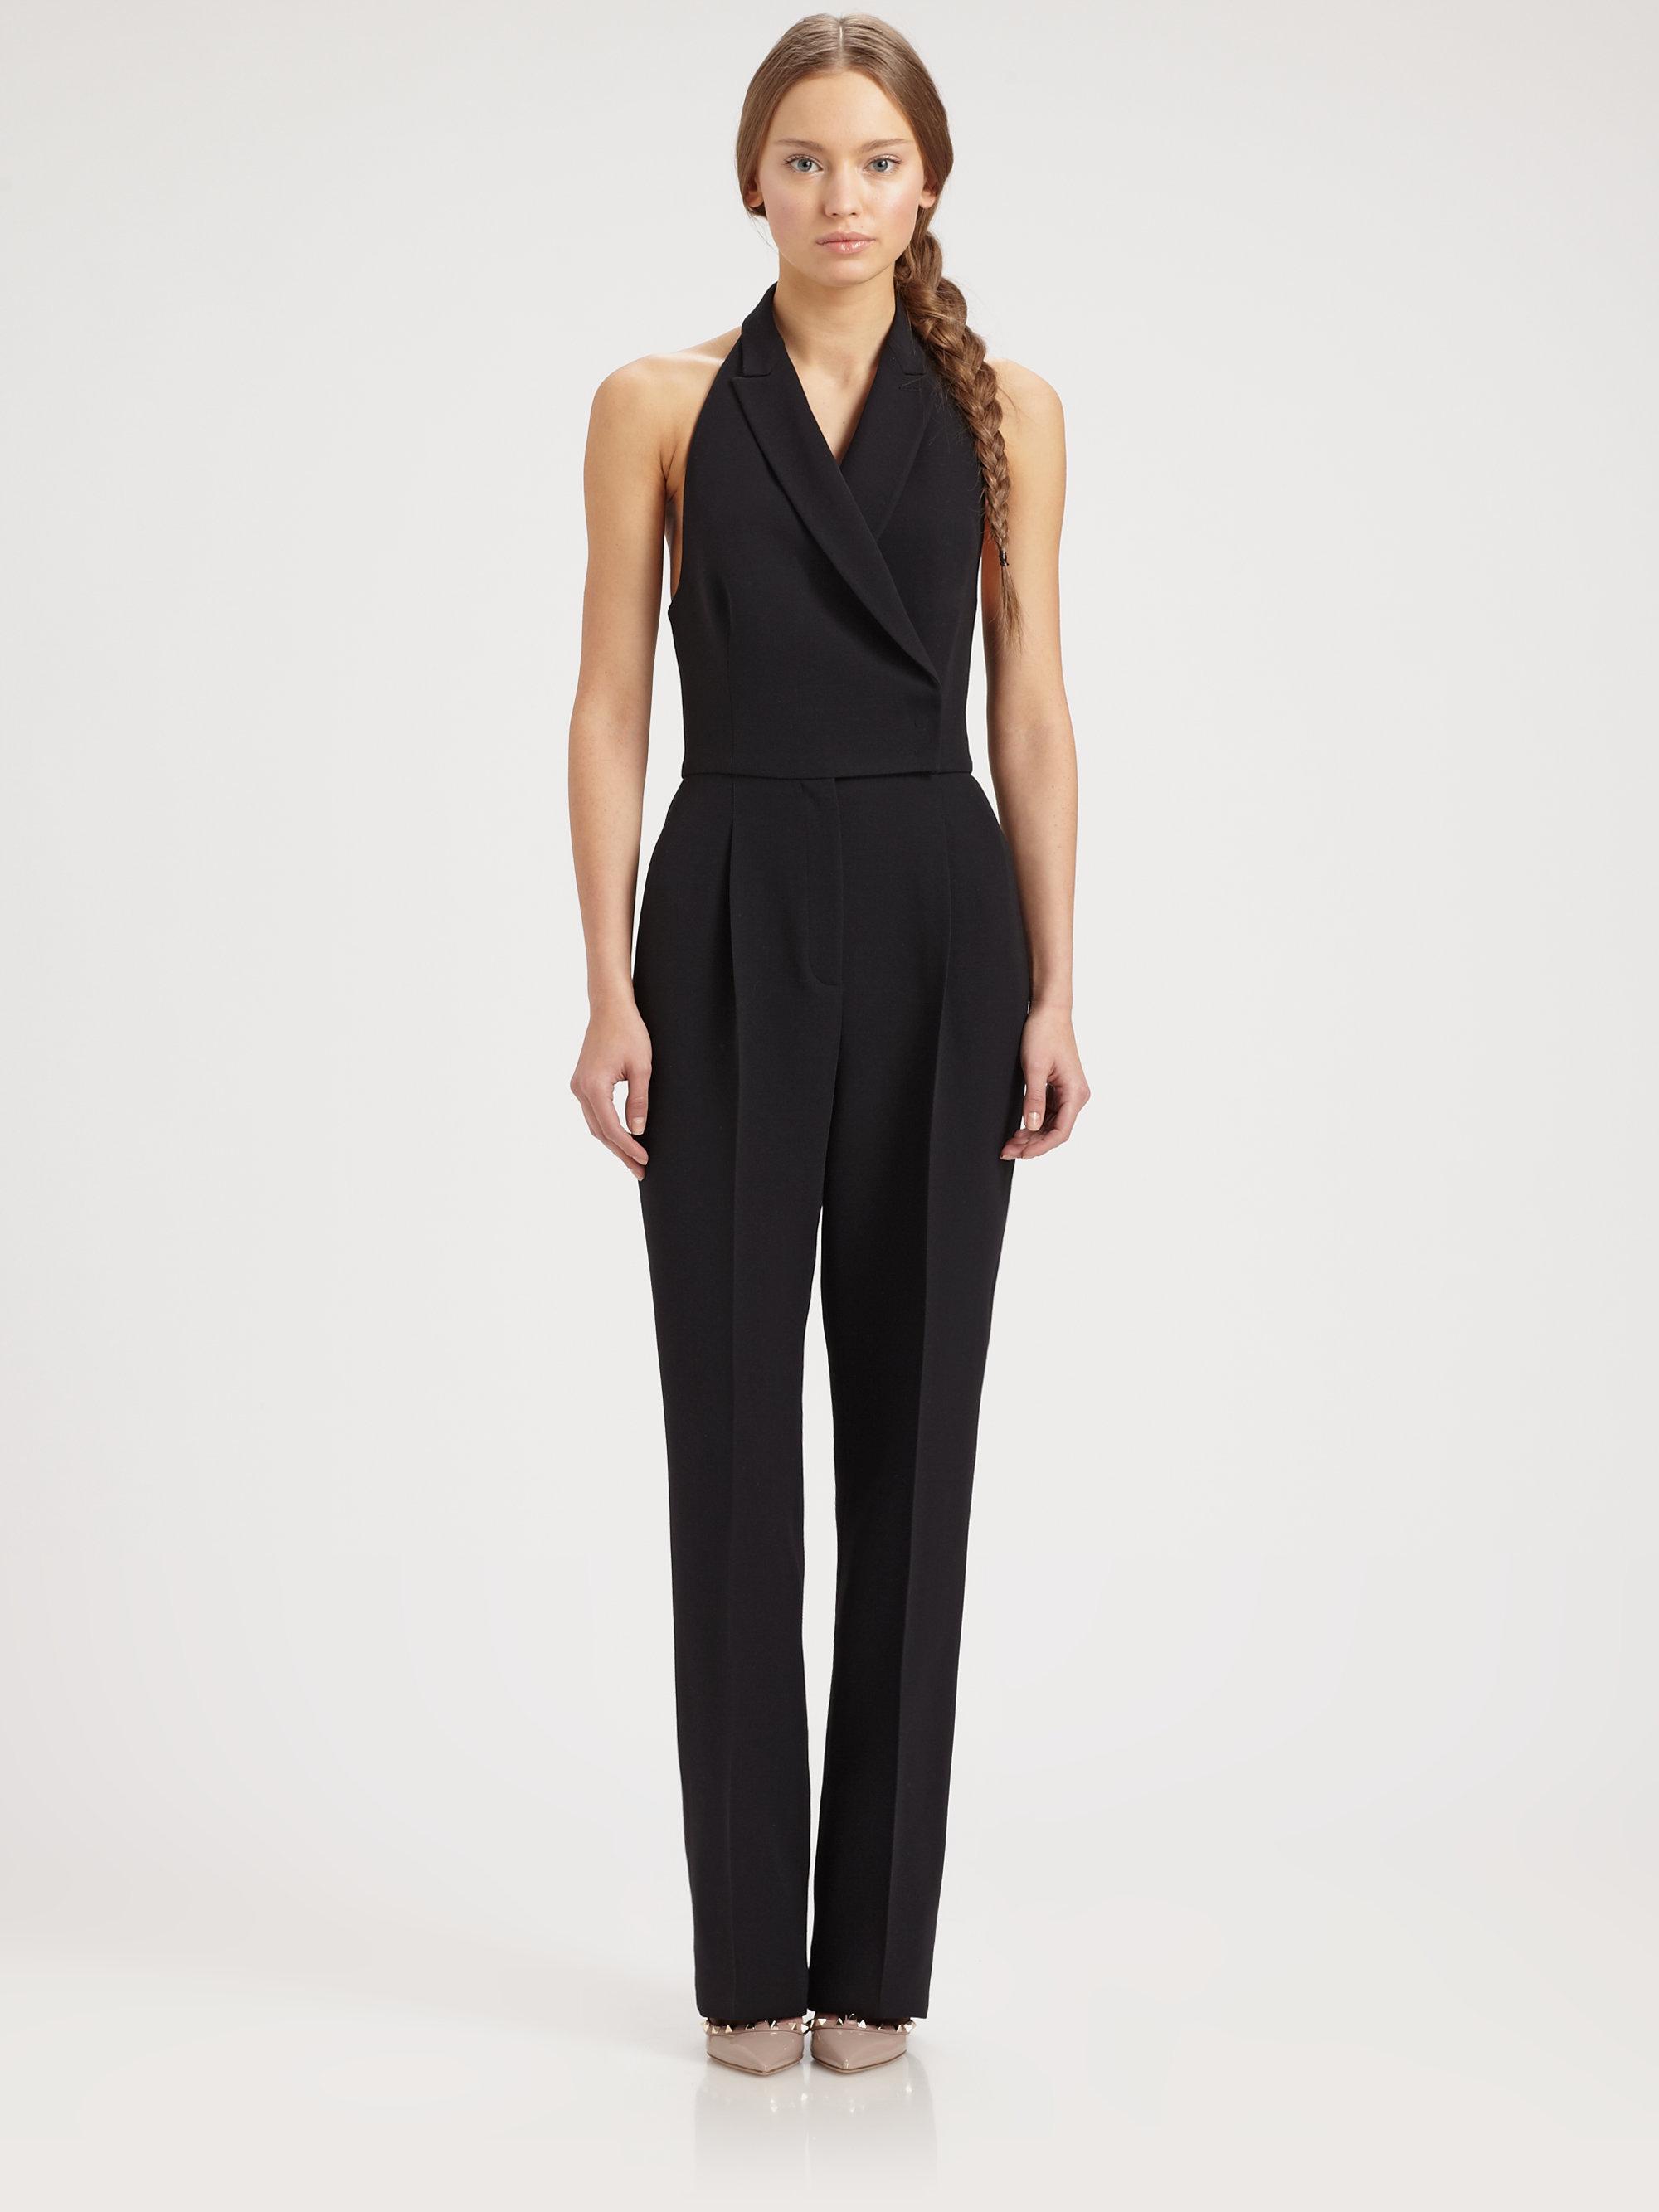 Lyst Valentino Tuxedo Jumpsuit In Black